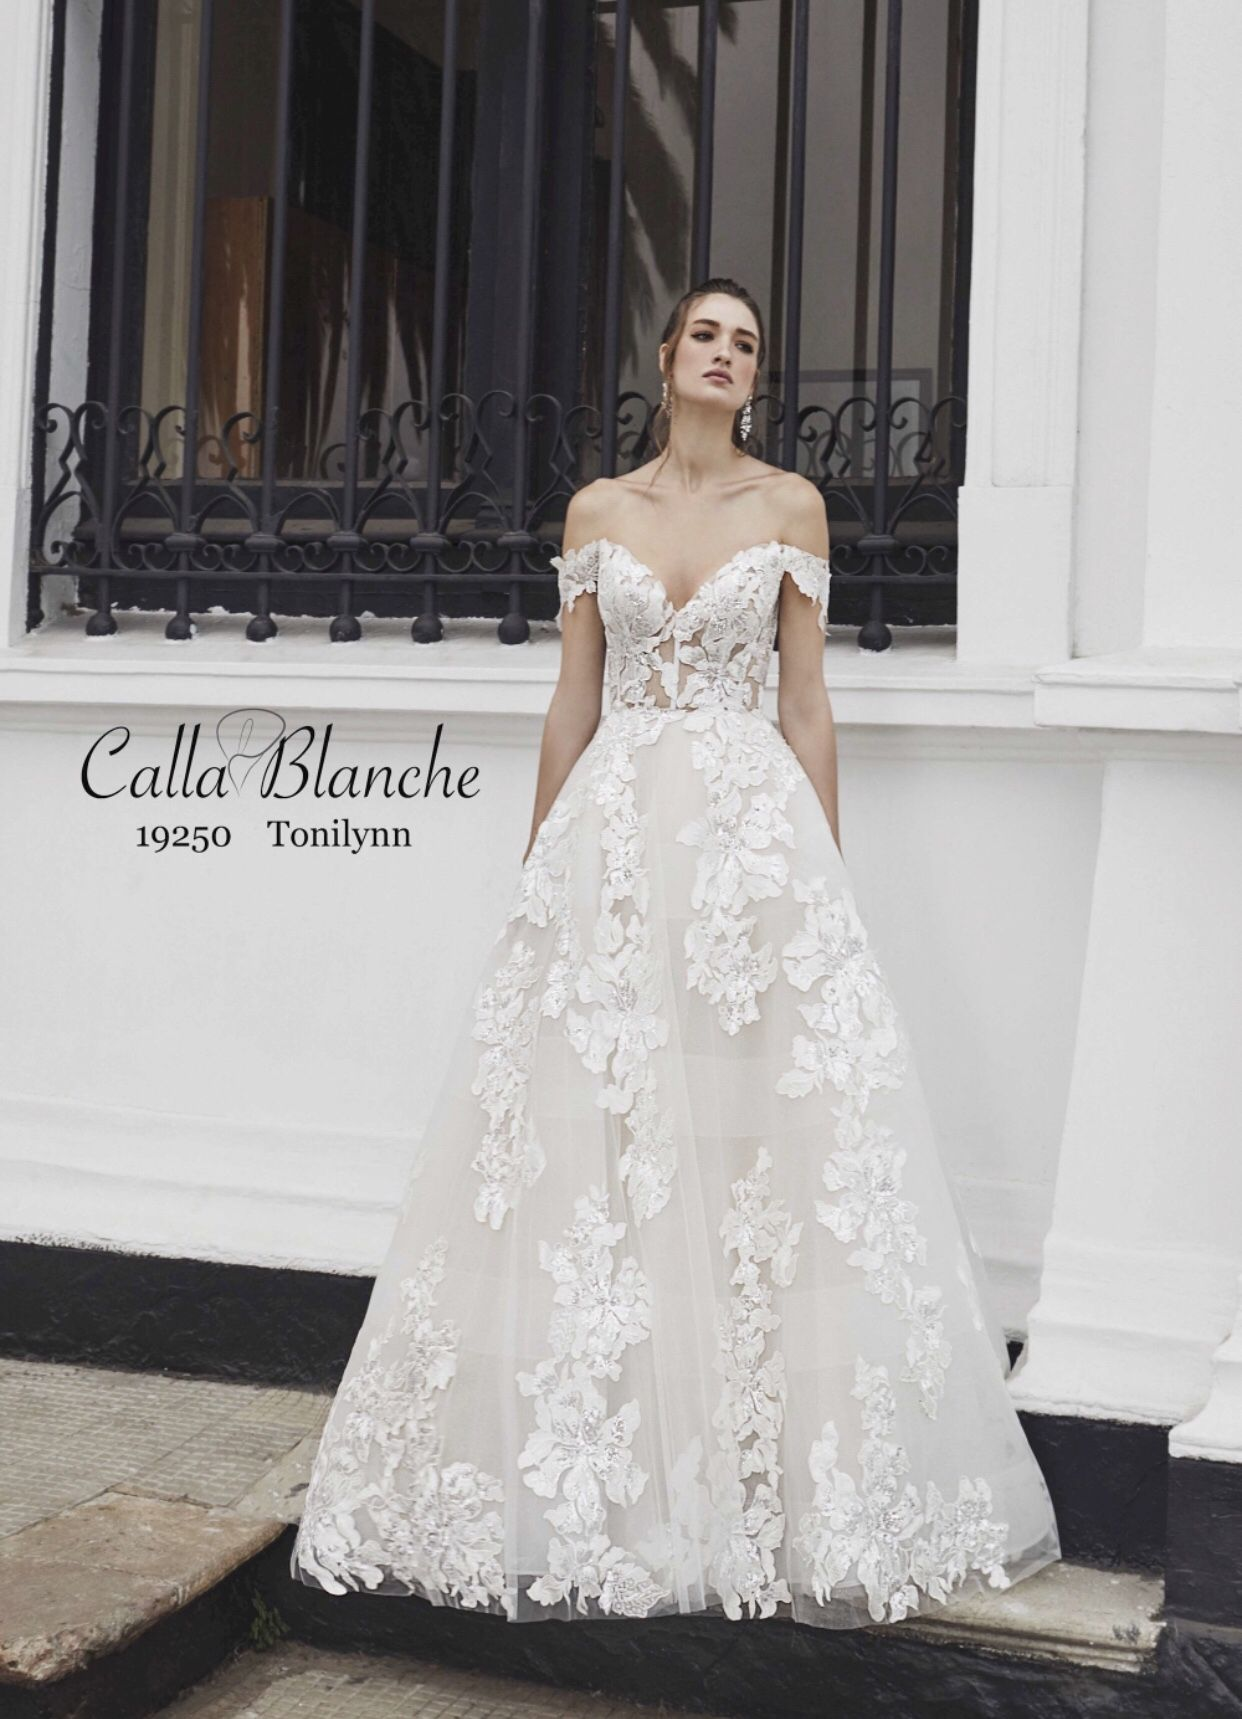 Weddingdresses Wedding Dresses Bride Bridal Love Fashion